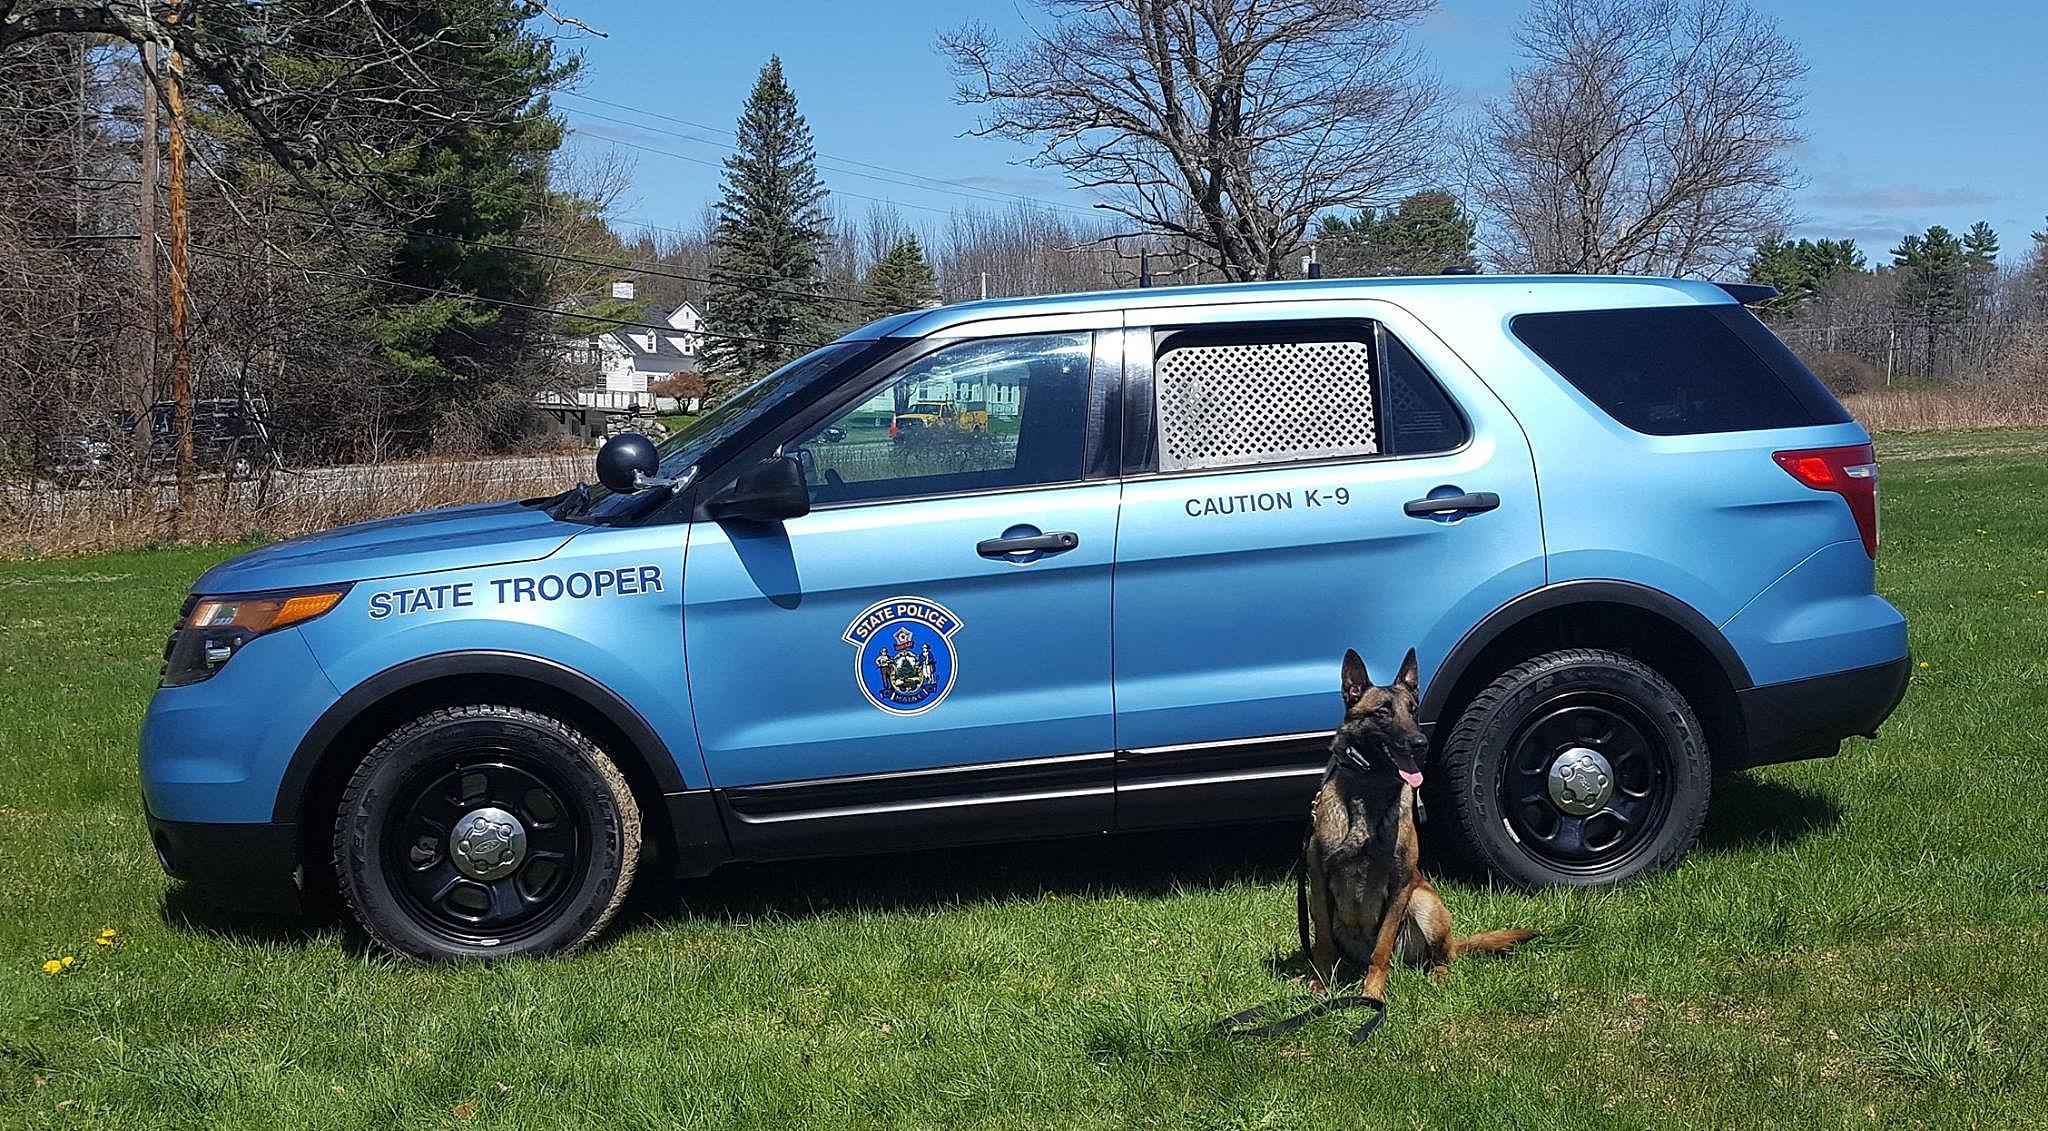 Maine Police K-9 Teams Graduate From Training [PHOTOS]